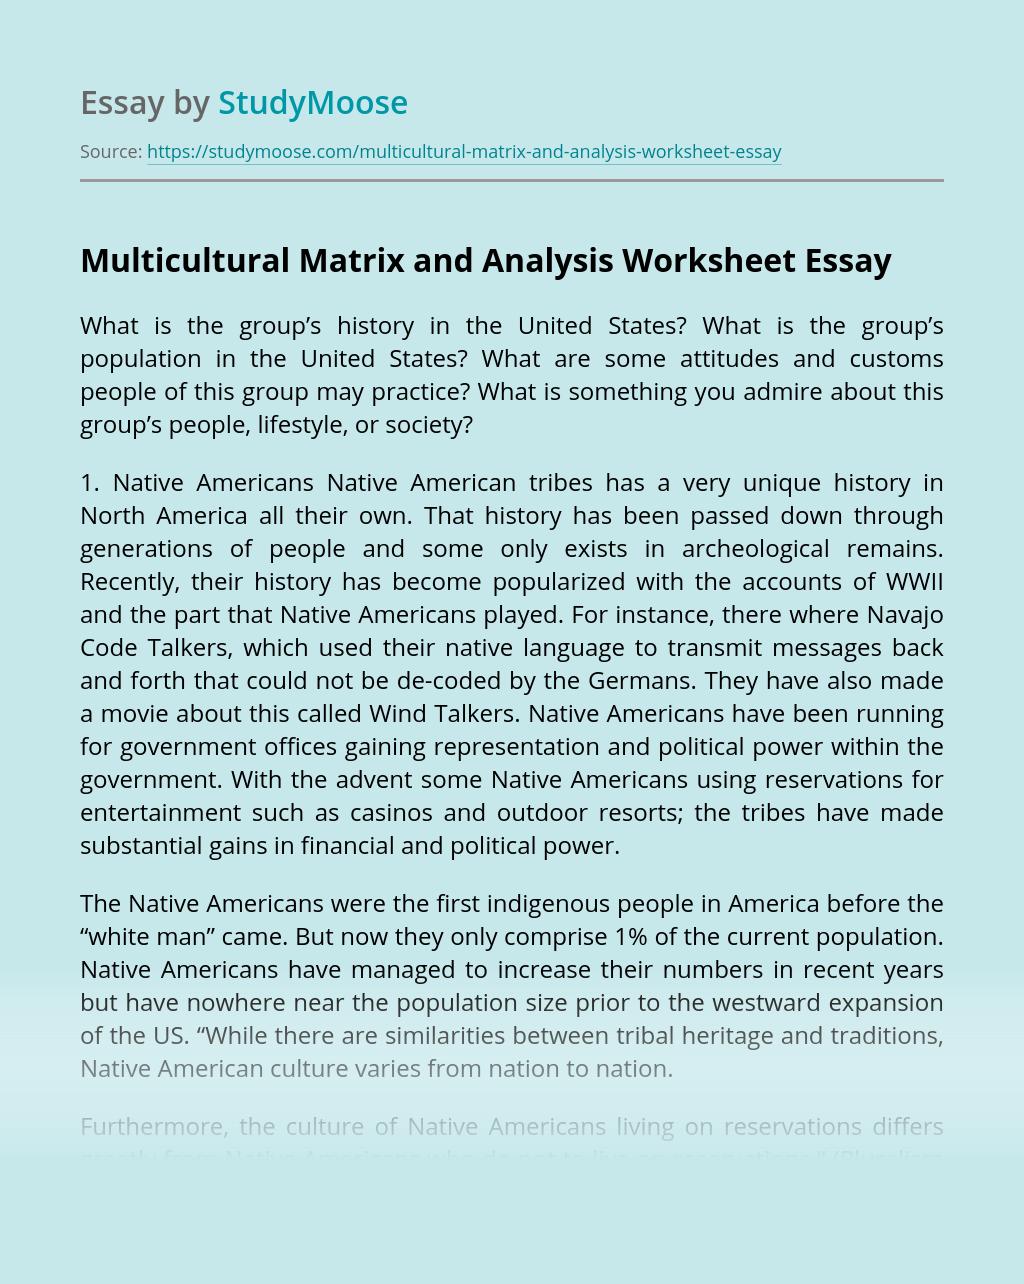 Multicultural Matrix and Analysis Worksheet